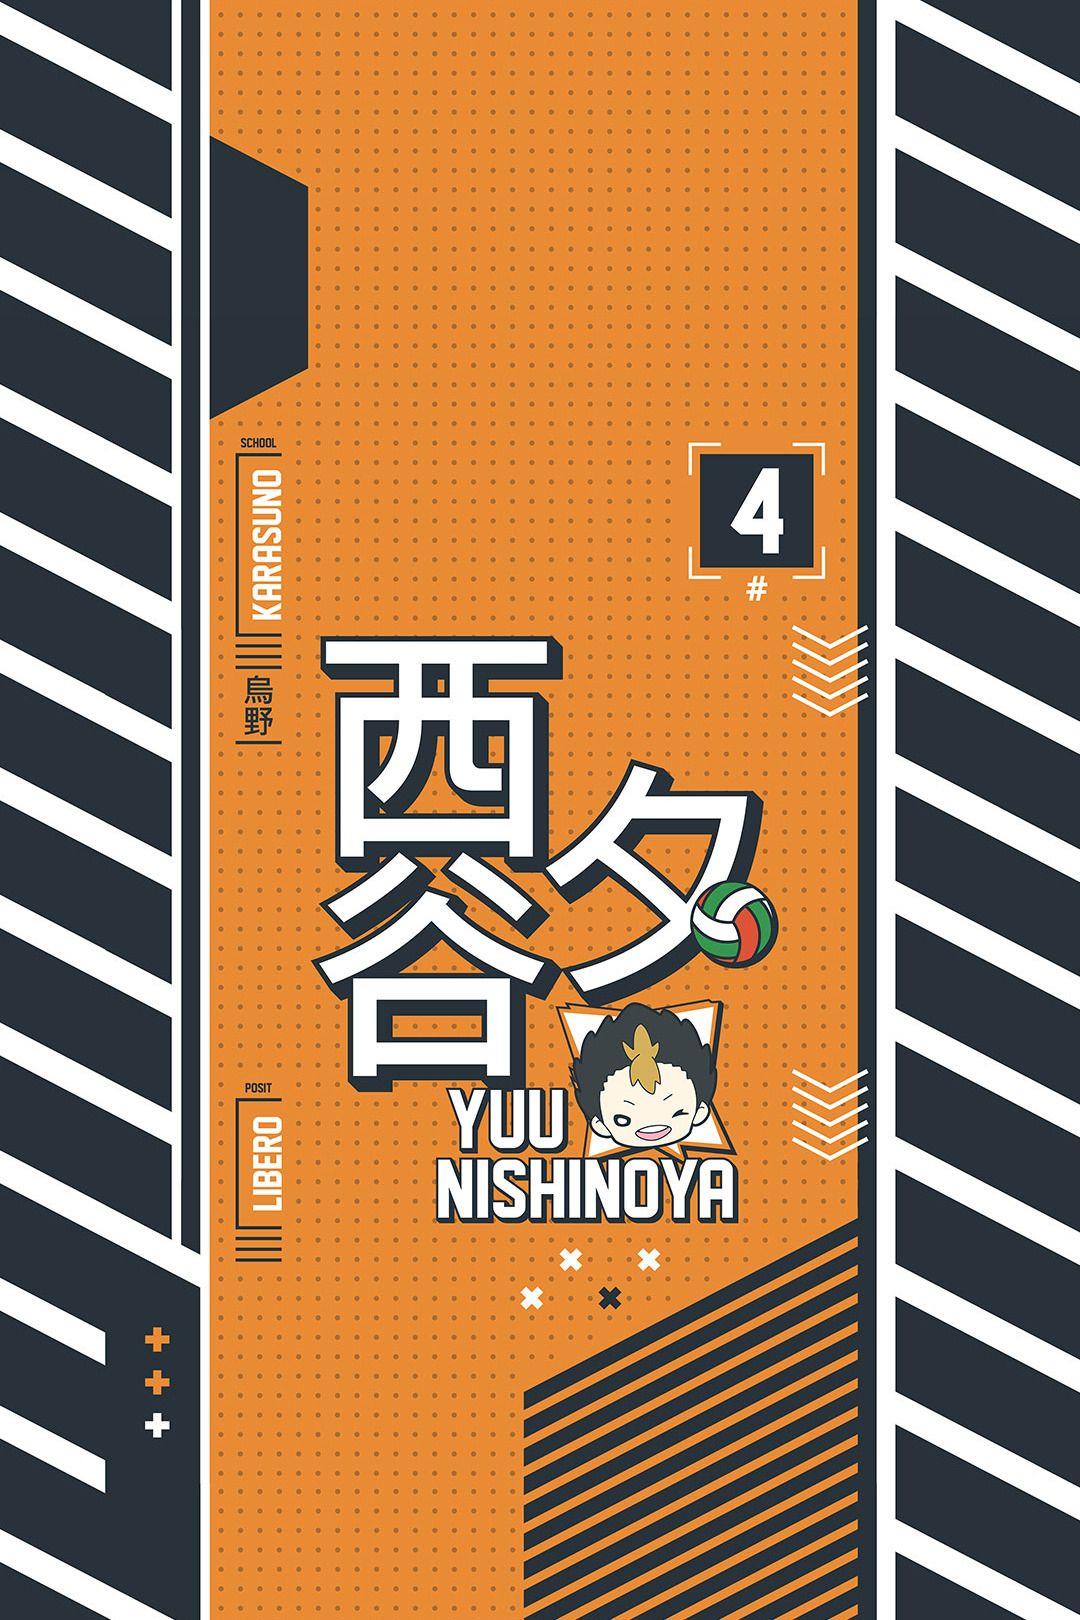 Yuu Nishinoya - Karasuno - Haikyuu